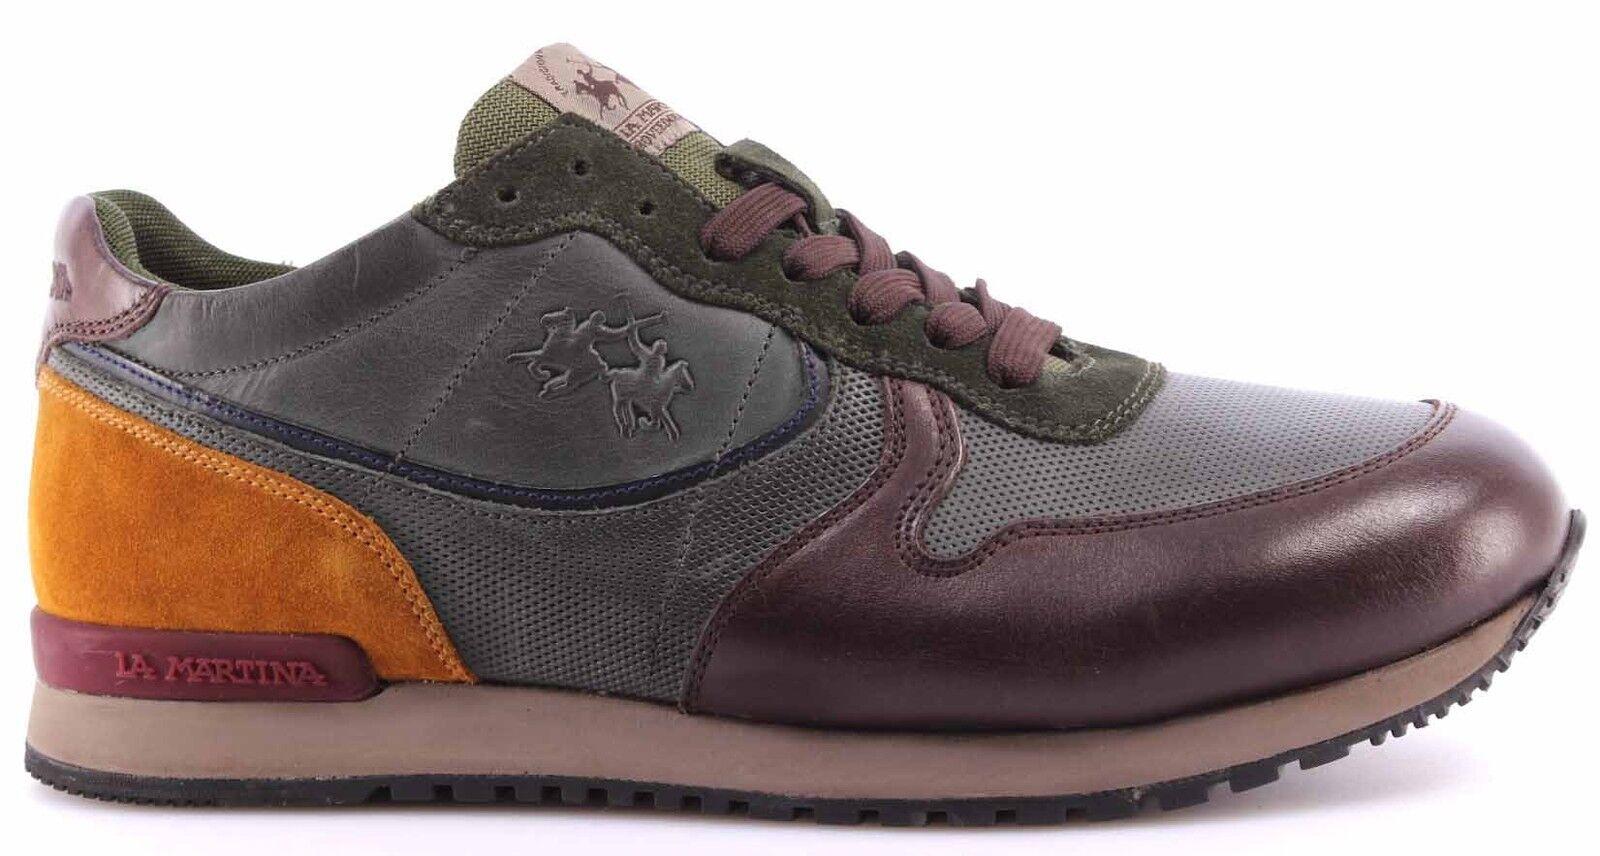 shoes Sneakers men LA MARTINA L2081212 Calf Delave TMgold Calf Delave Green ITA